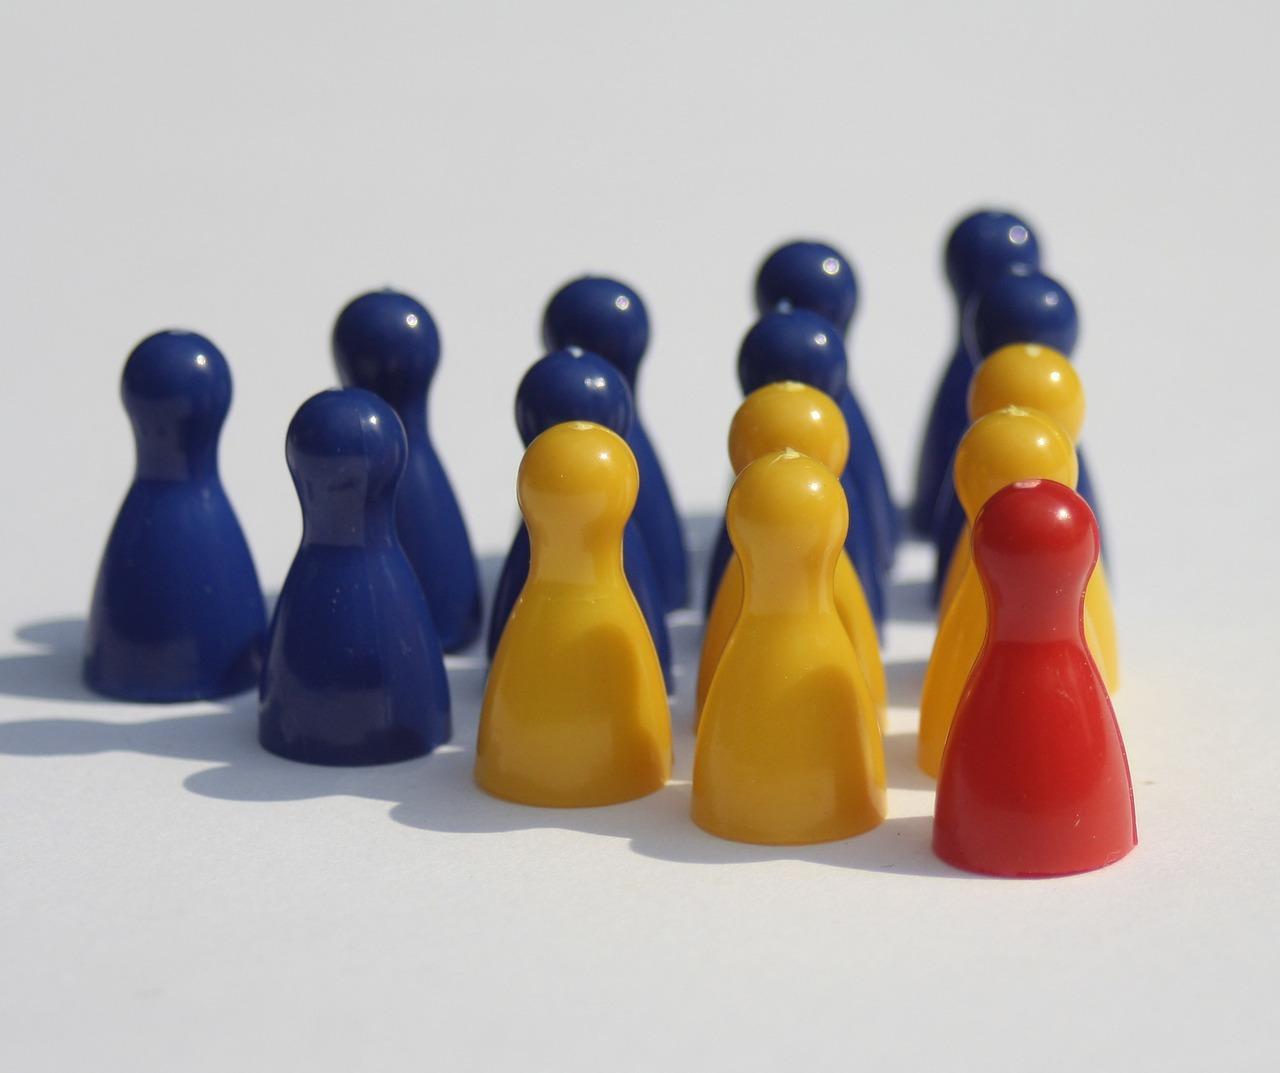 Focus on staff, not price cuts